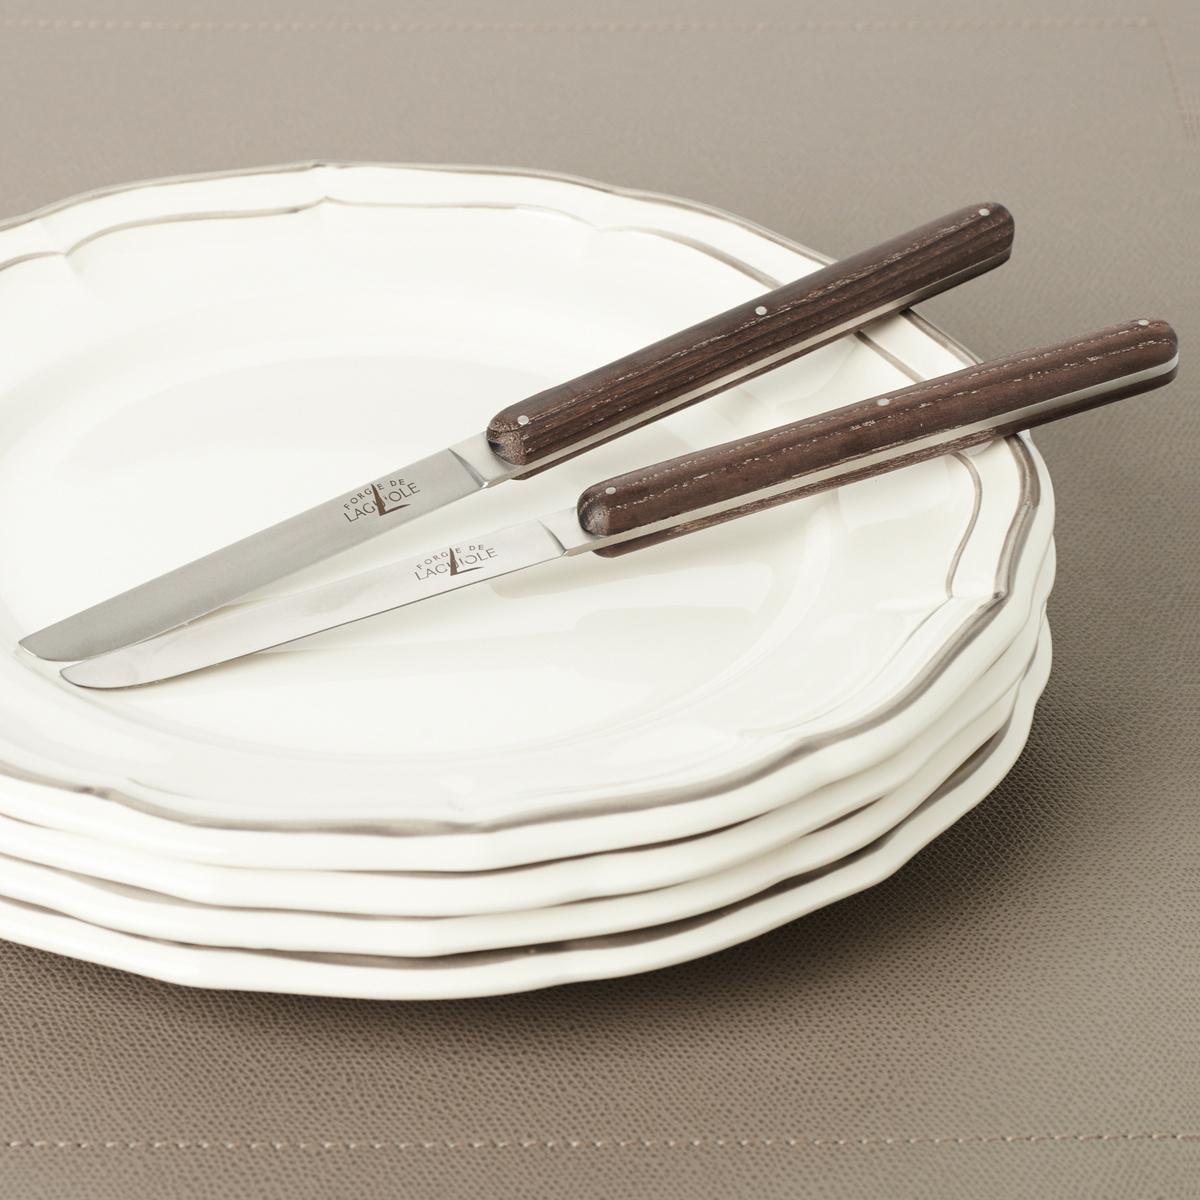 "Tafel-/Steakmesser ""Andrée Putman"", mit Eschenholzgriff"